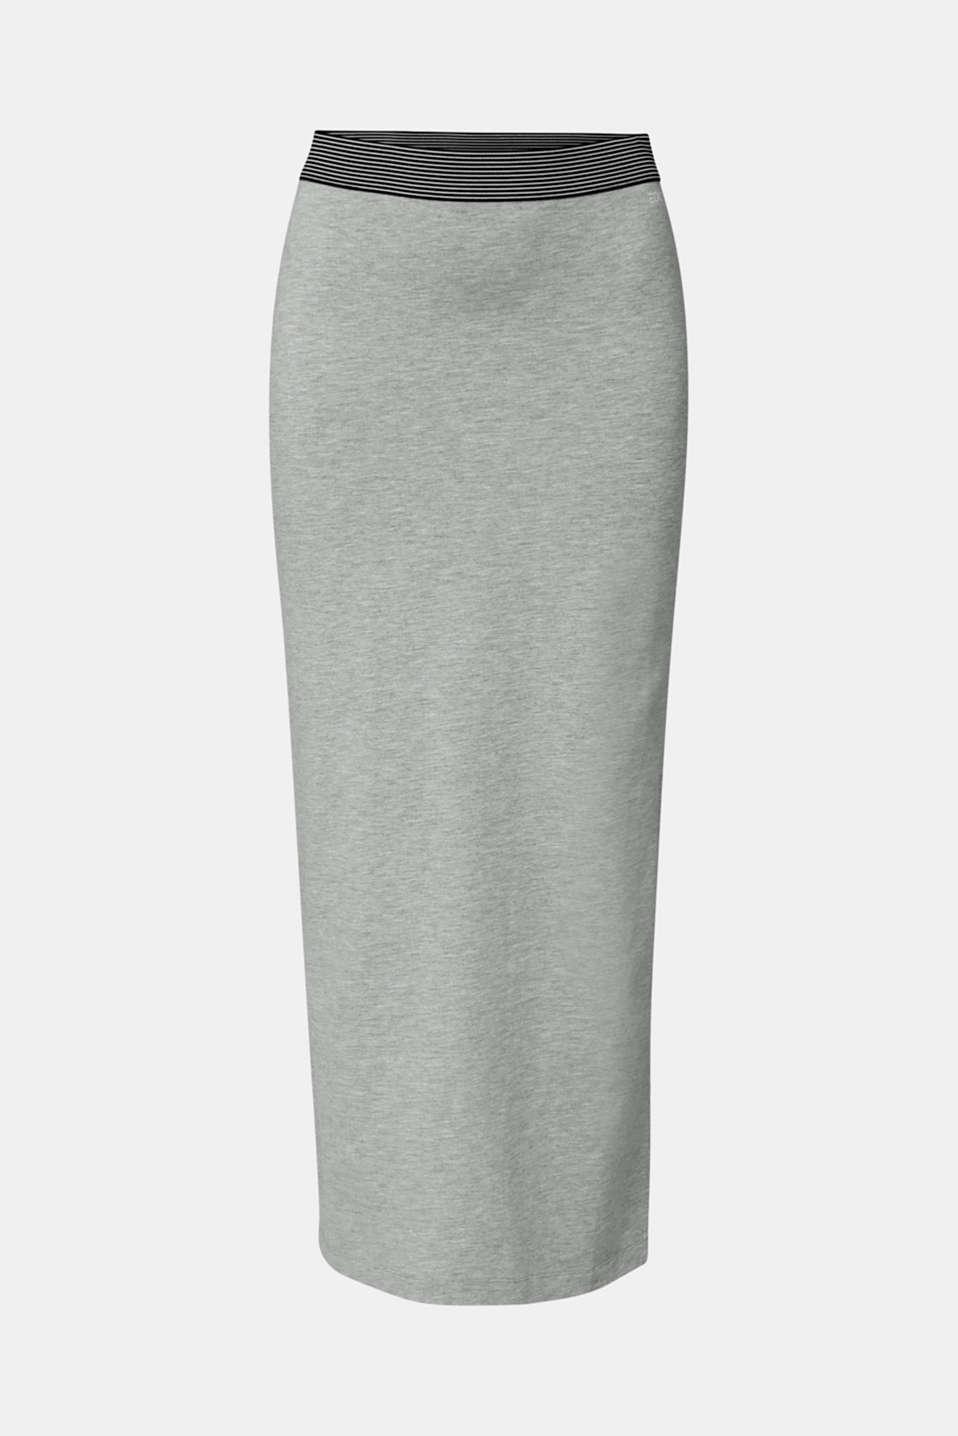 Stretch jersey skirt, LIGHT GREY 5, detail image number 6